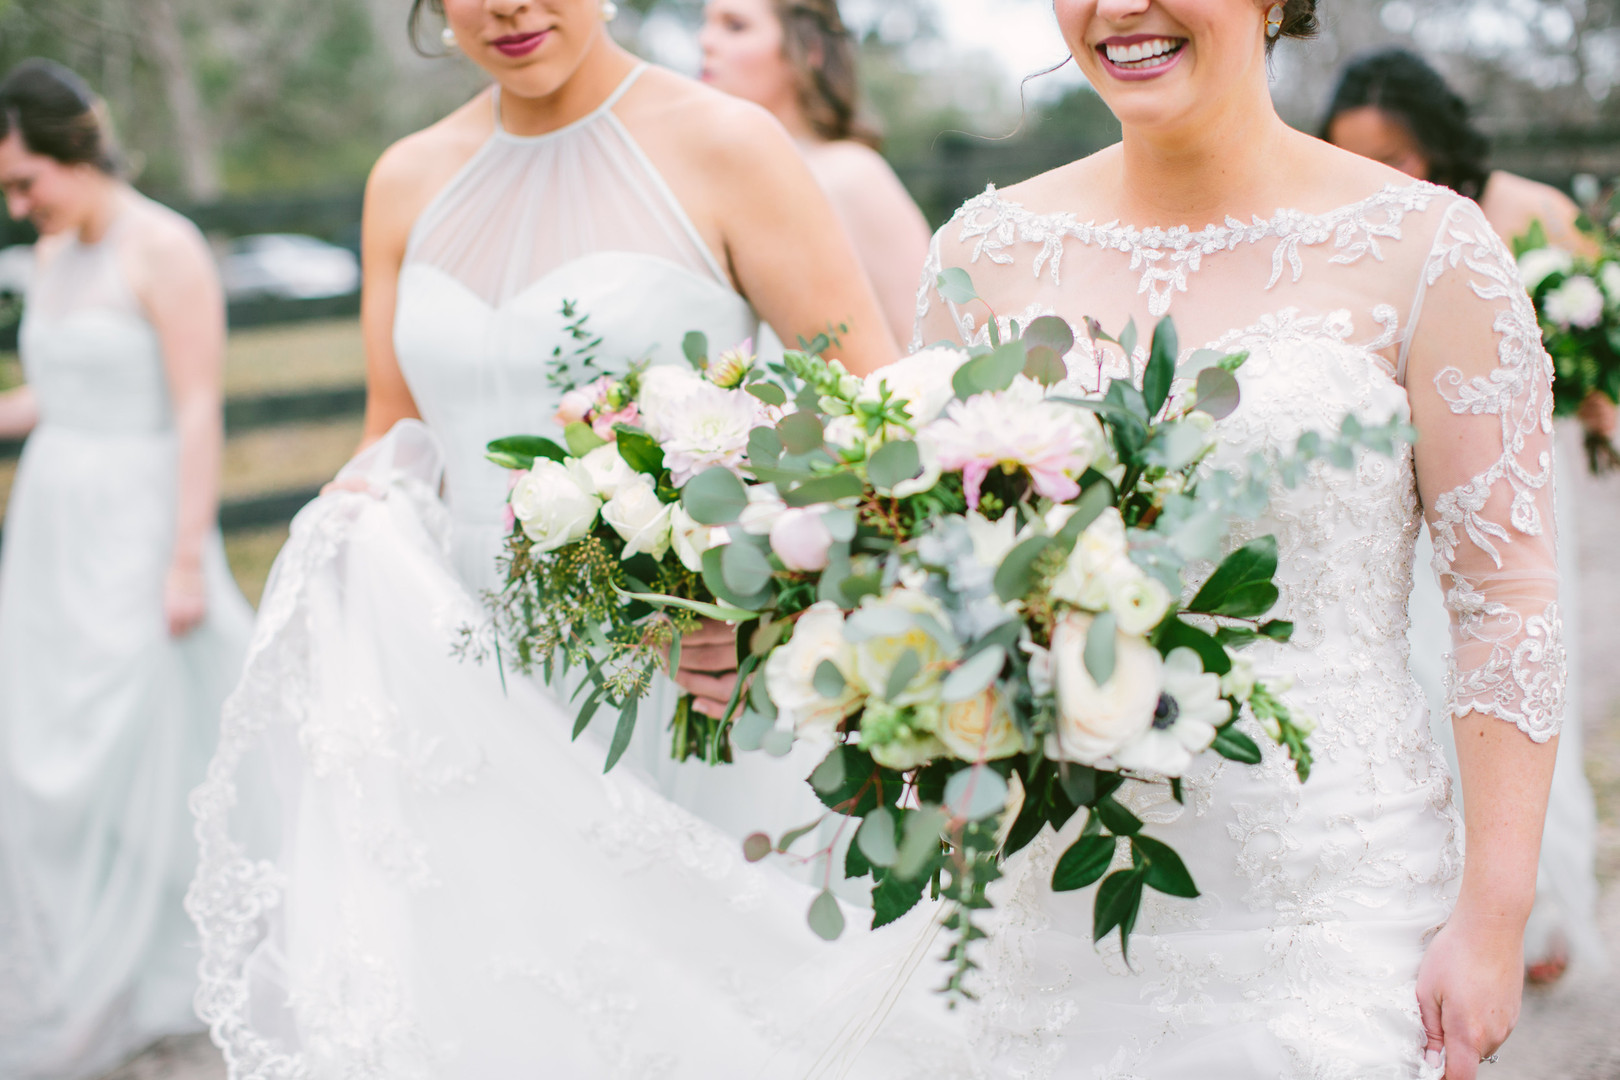 oak-point-plantation-wedding-18.jpg